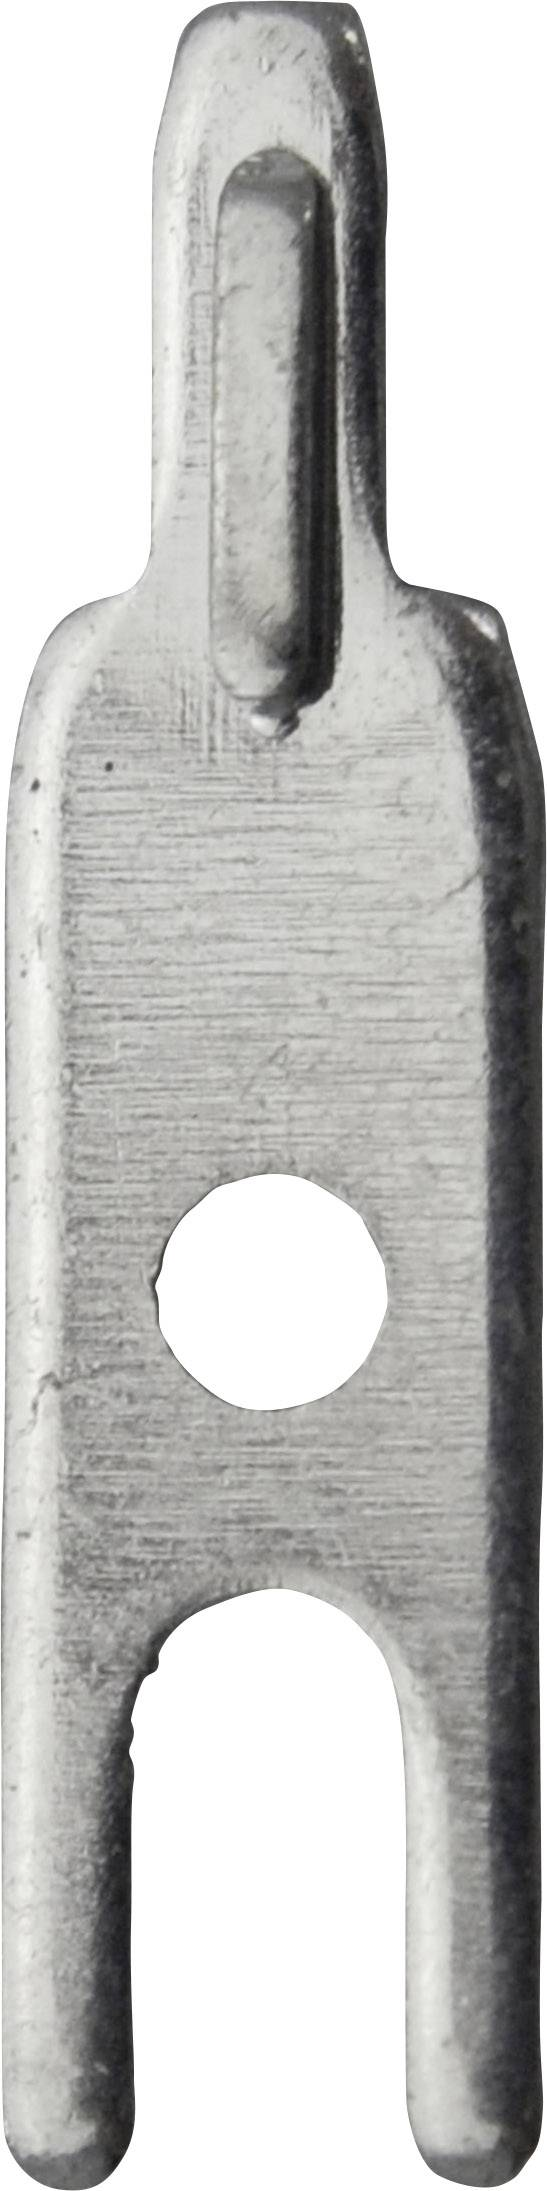 Lötstift verzinnt Verbindungstechnik 100 St.